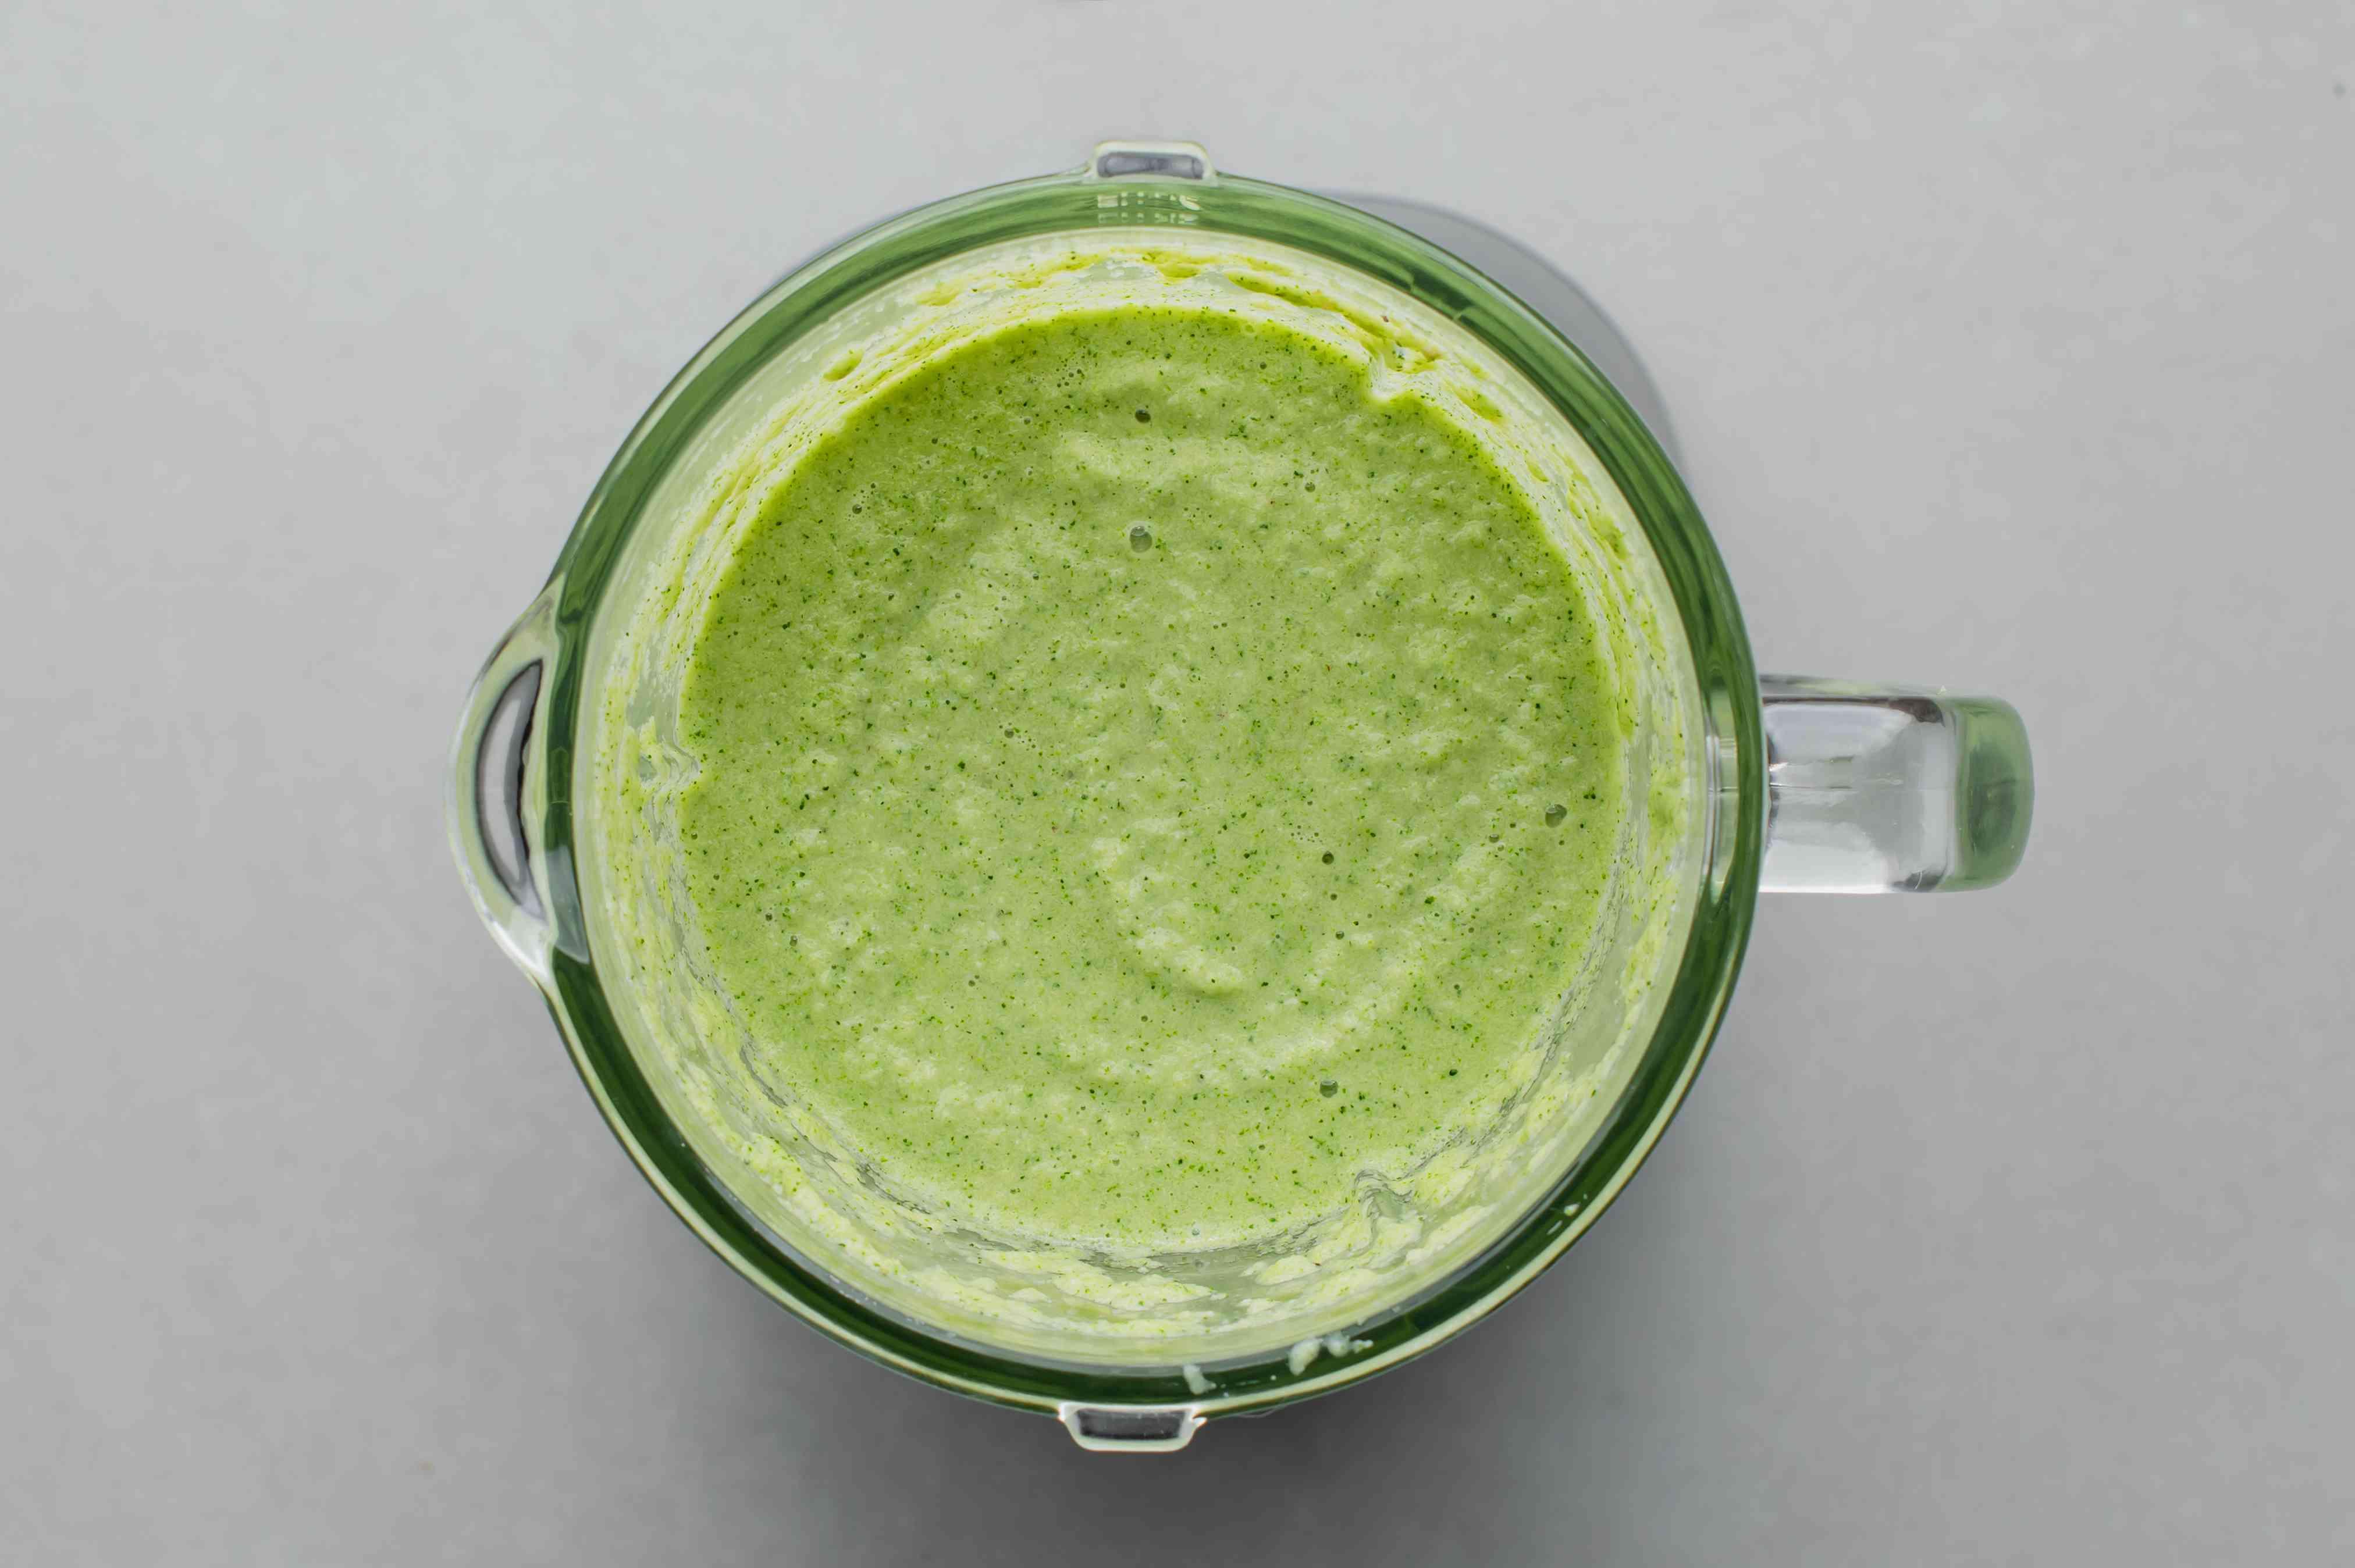 Raw Vegan Cream of Broccoli Soup ingredients in a blender